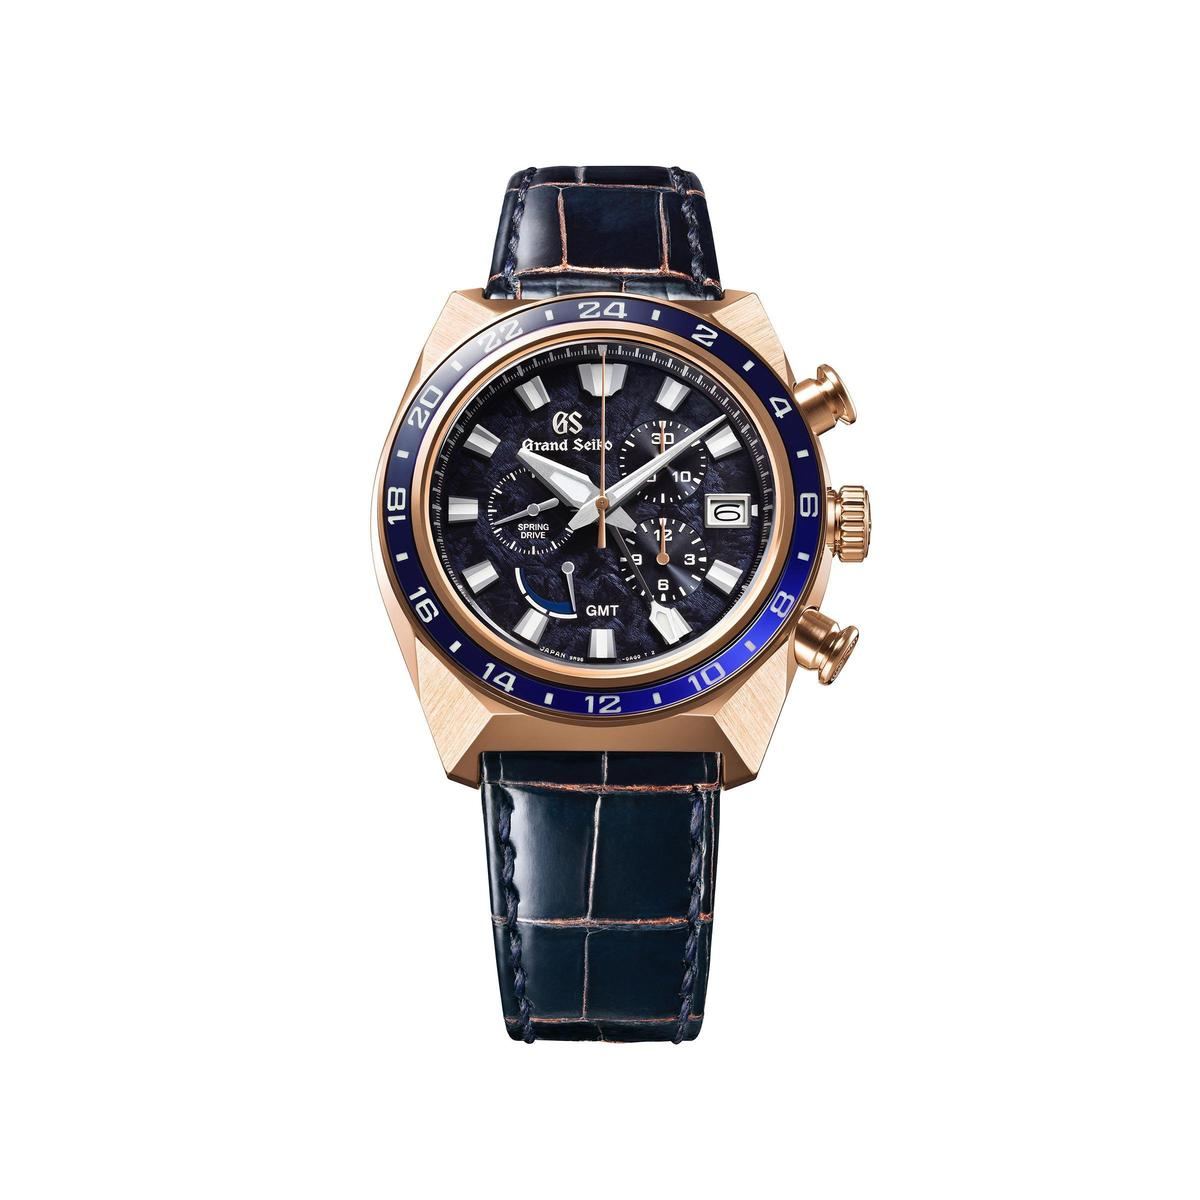 GRAND SEIKO 60周年紀念限定錶款SBGC238,全球限量100只,建議售價NT$1,400,000。